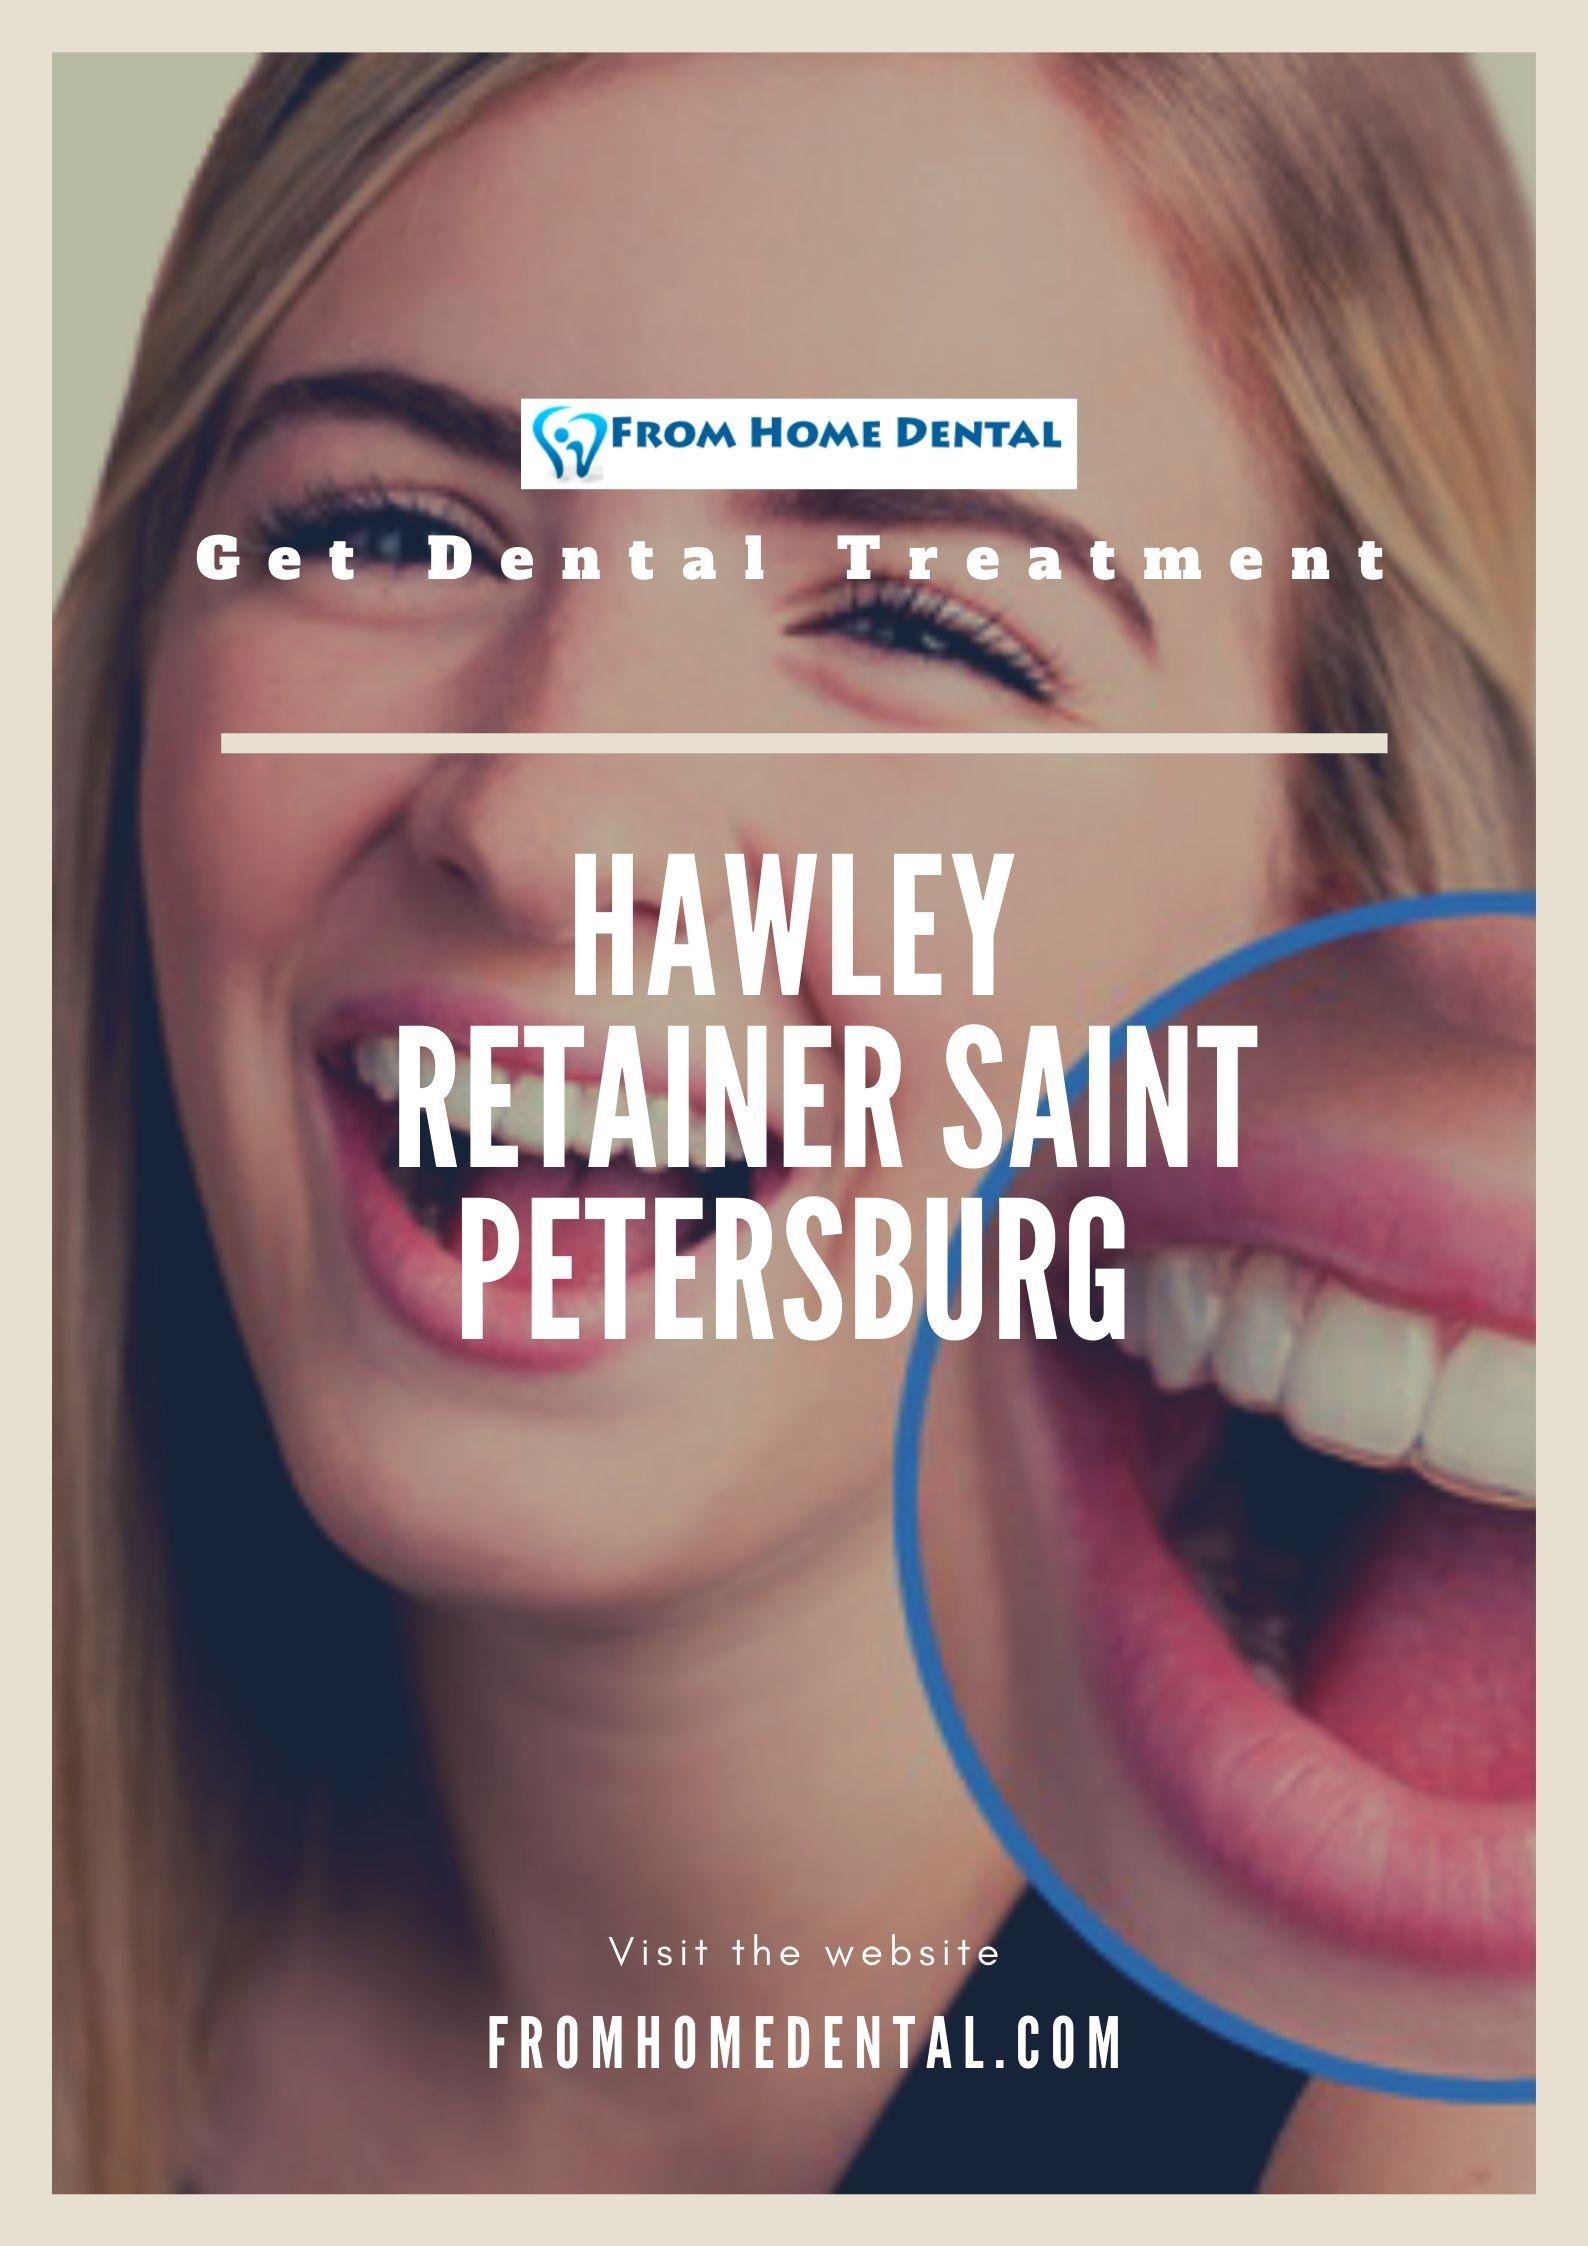 Hawley Retainer Saint Petersburg From Home Dental